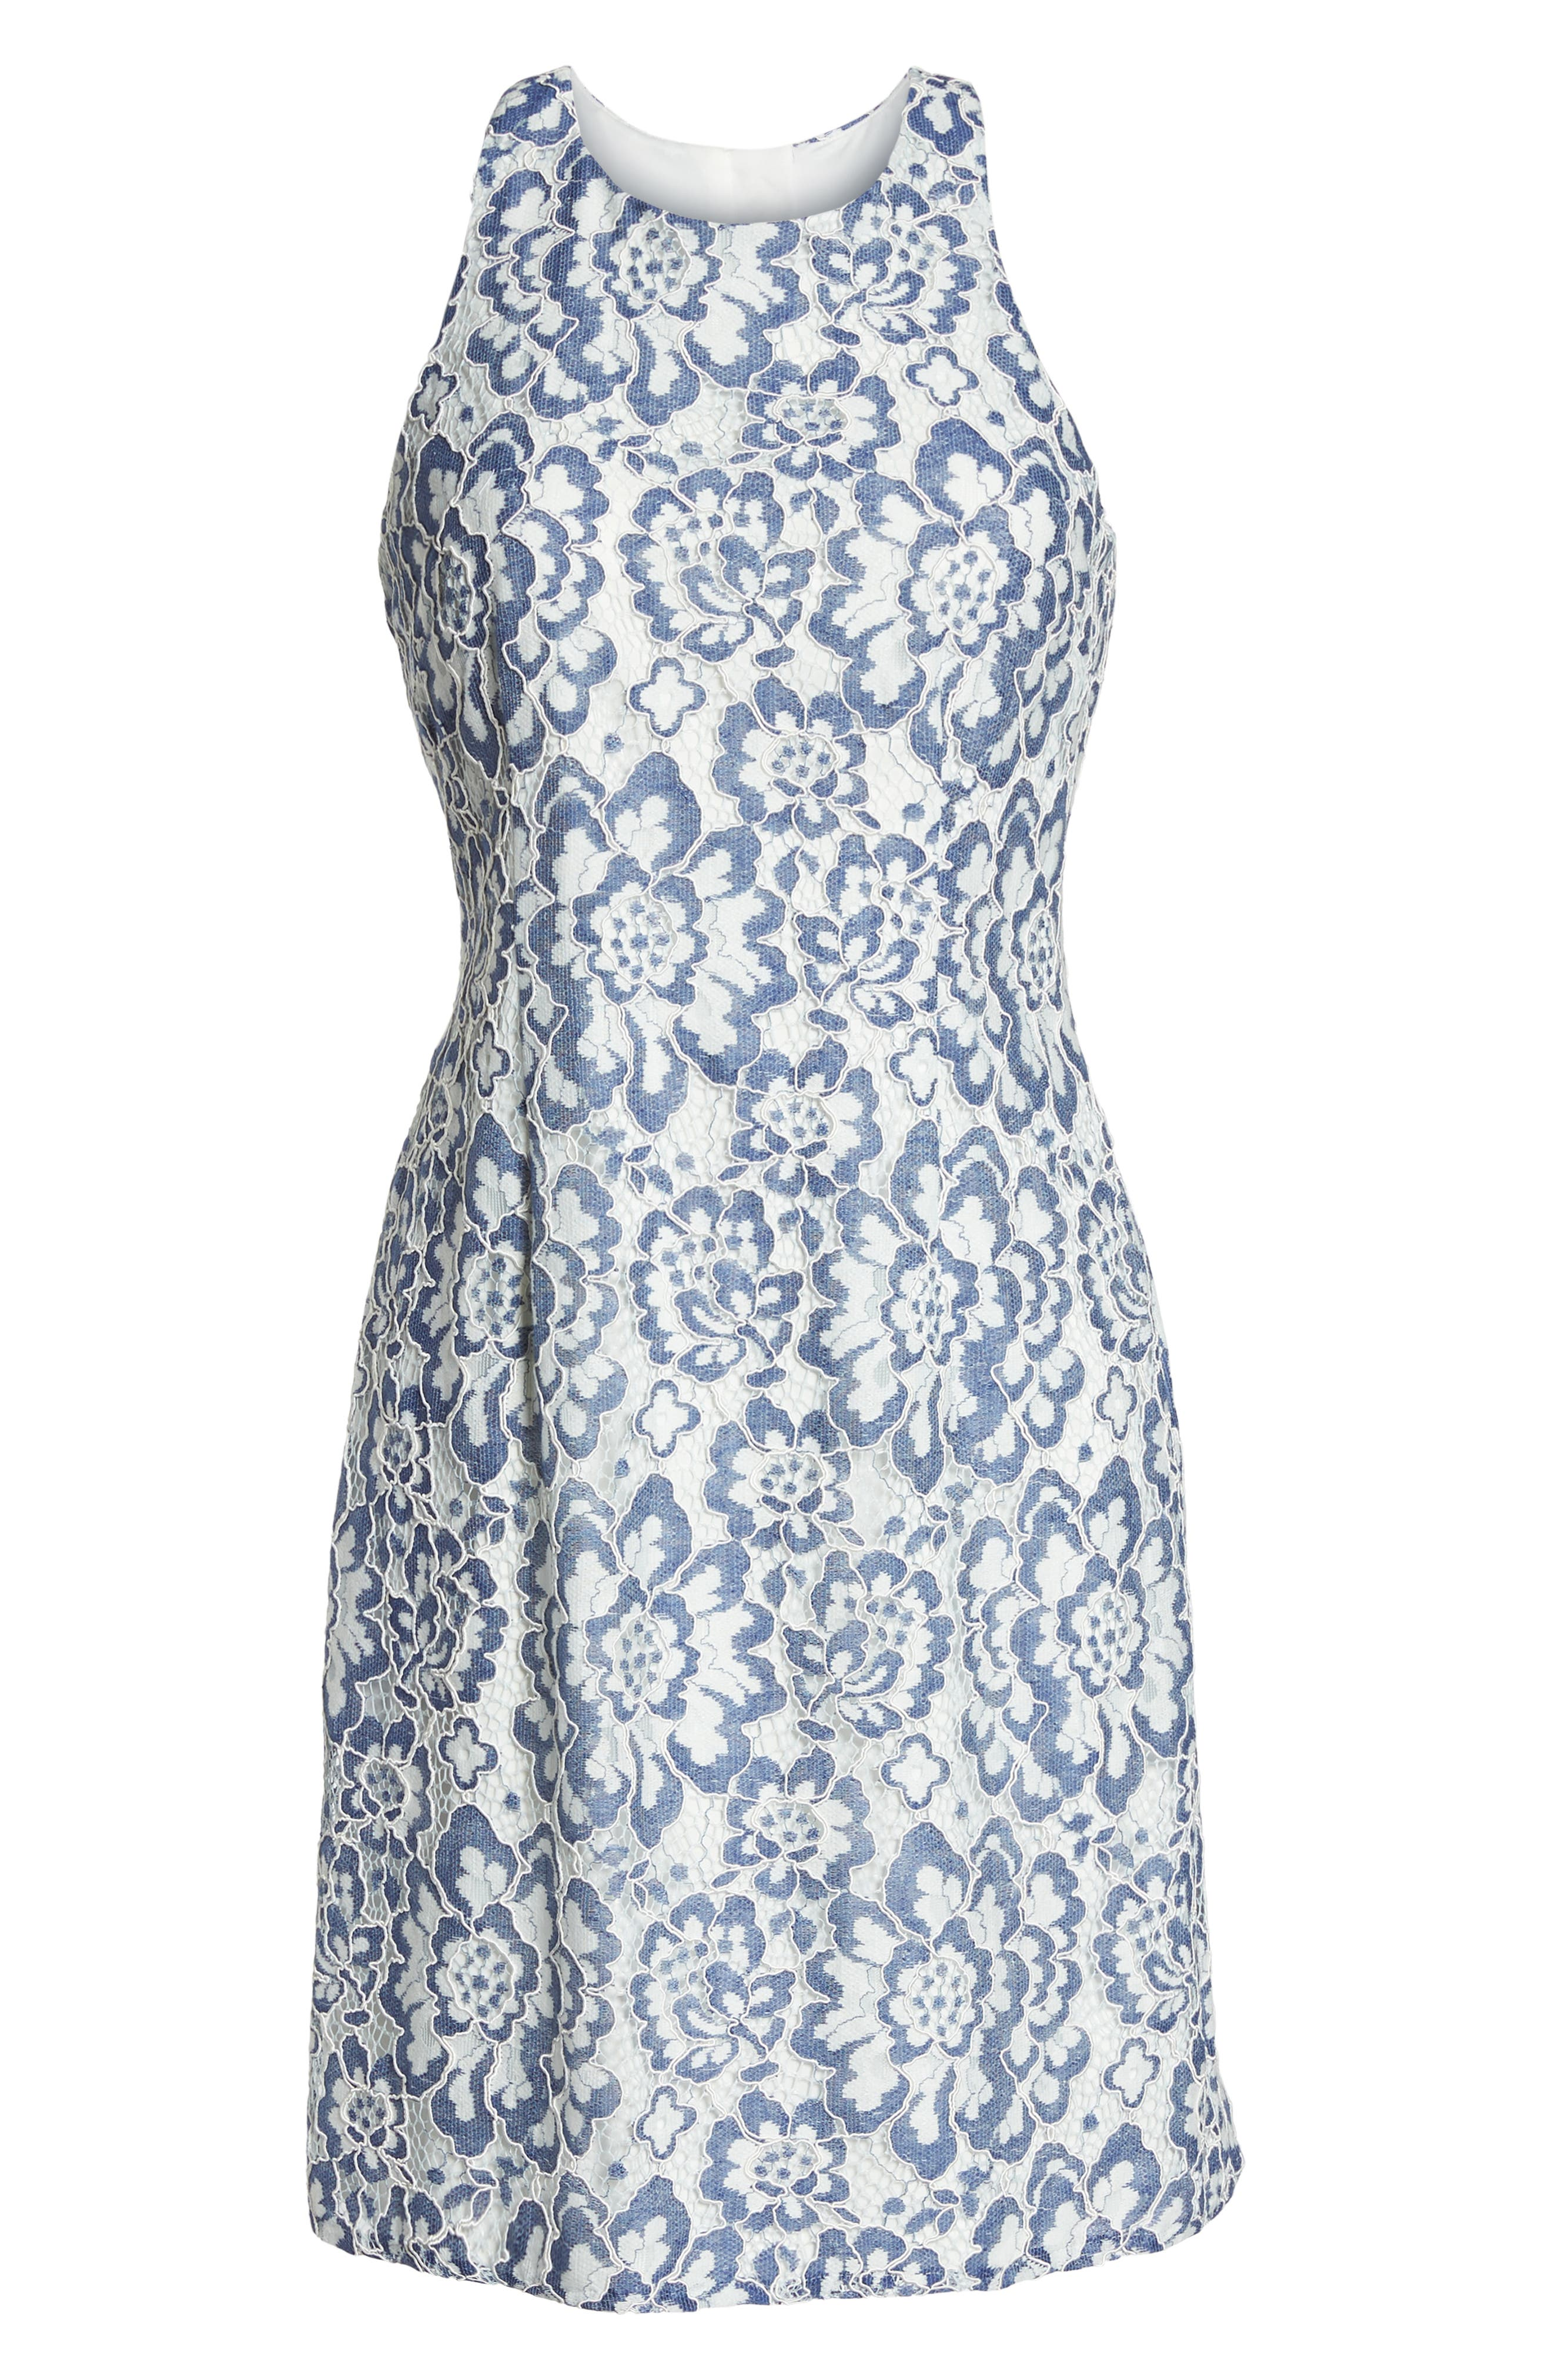 ADRIANNA PAPELL,                             Elisa Two Tone Lace Sheath Dress,                             Alternate thumbnail 7, color,                             481